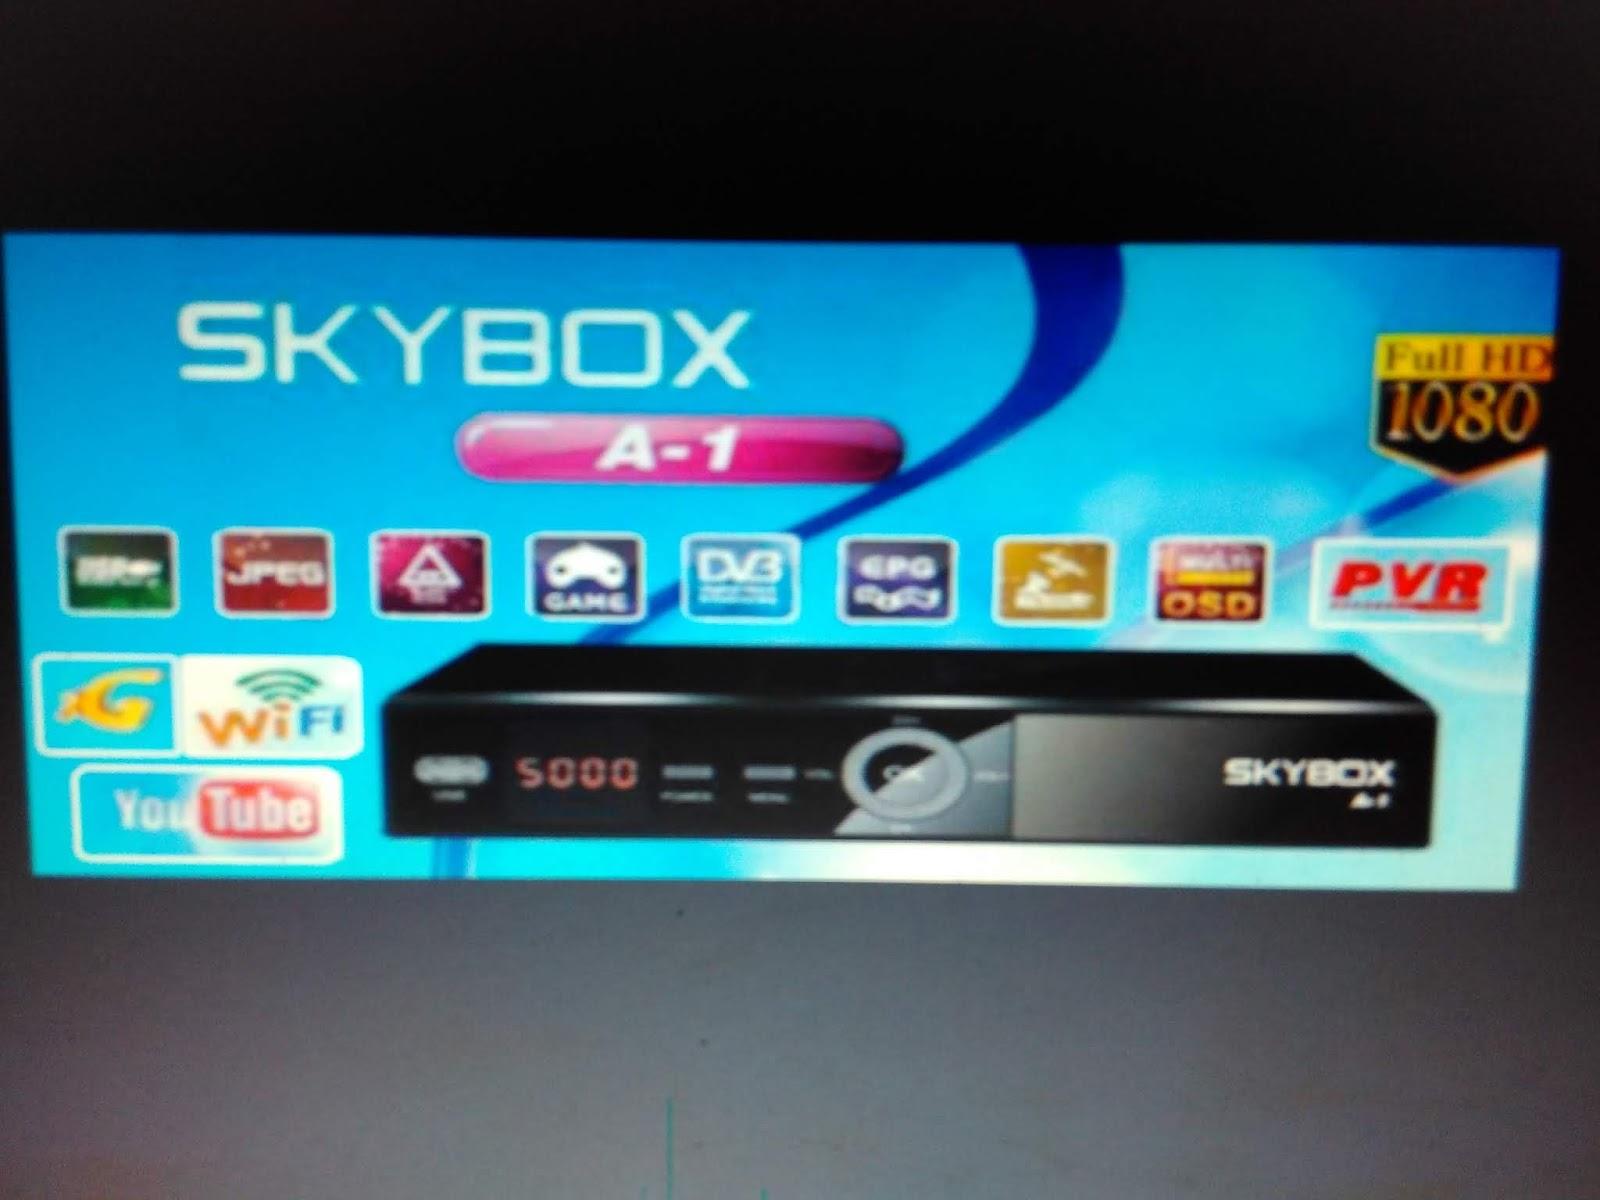 Panduan Cara Menggunakan Aplikasi Easy Cash Gichiardy Skybox A1 Ganti Firmware Icone Di A 1 Old